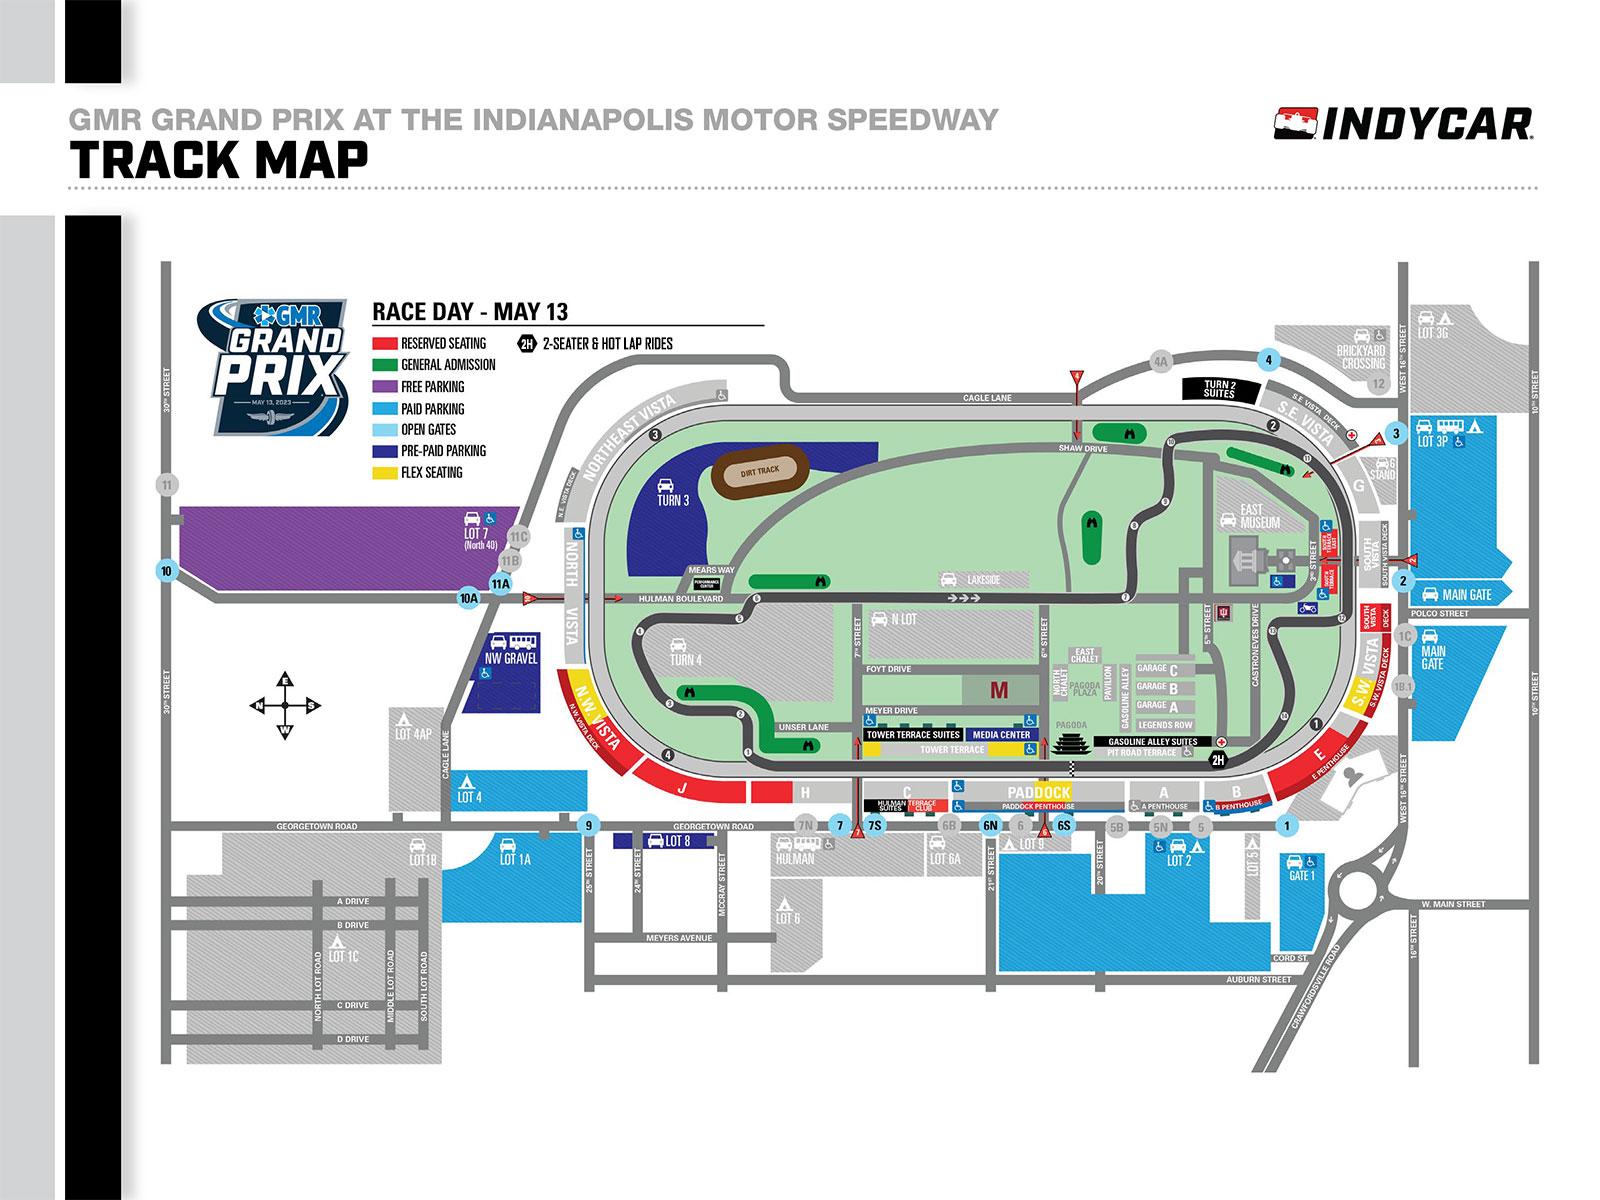 Indianapolis Motor Speedway Track Map - impremedia.net